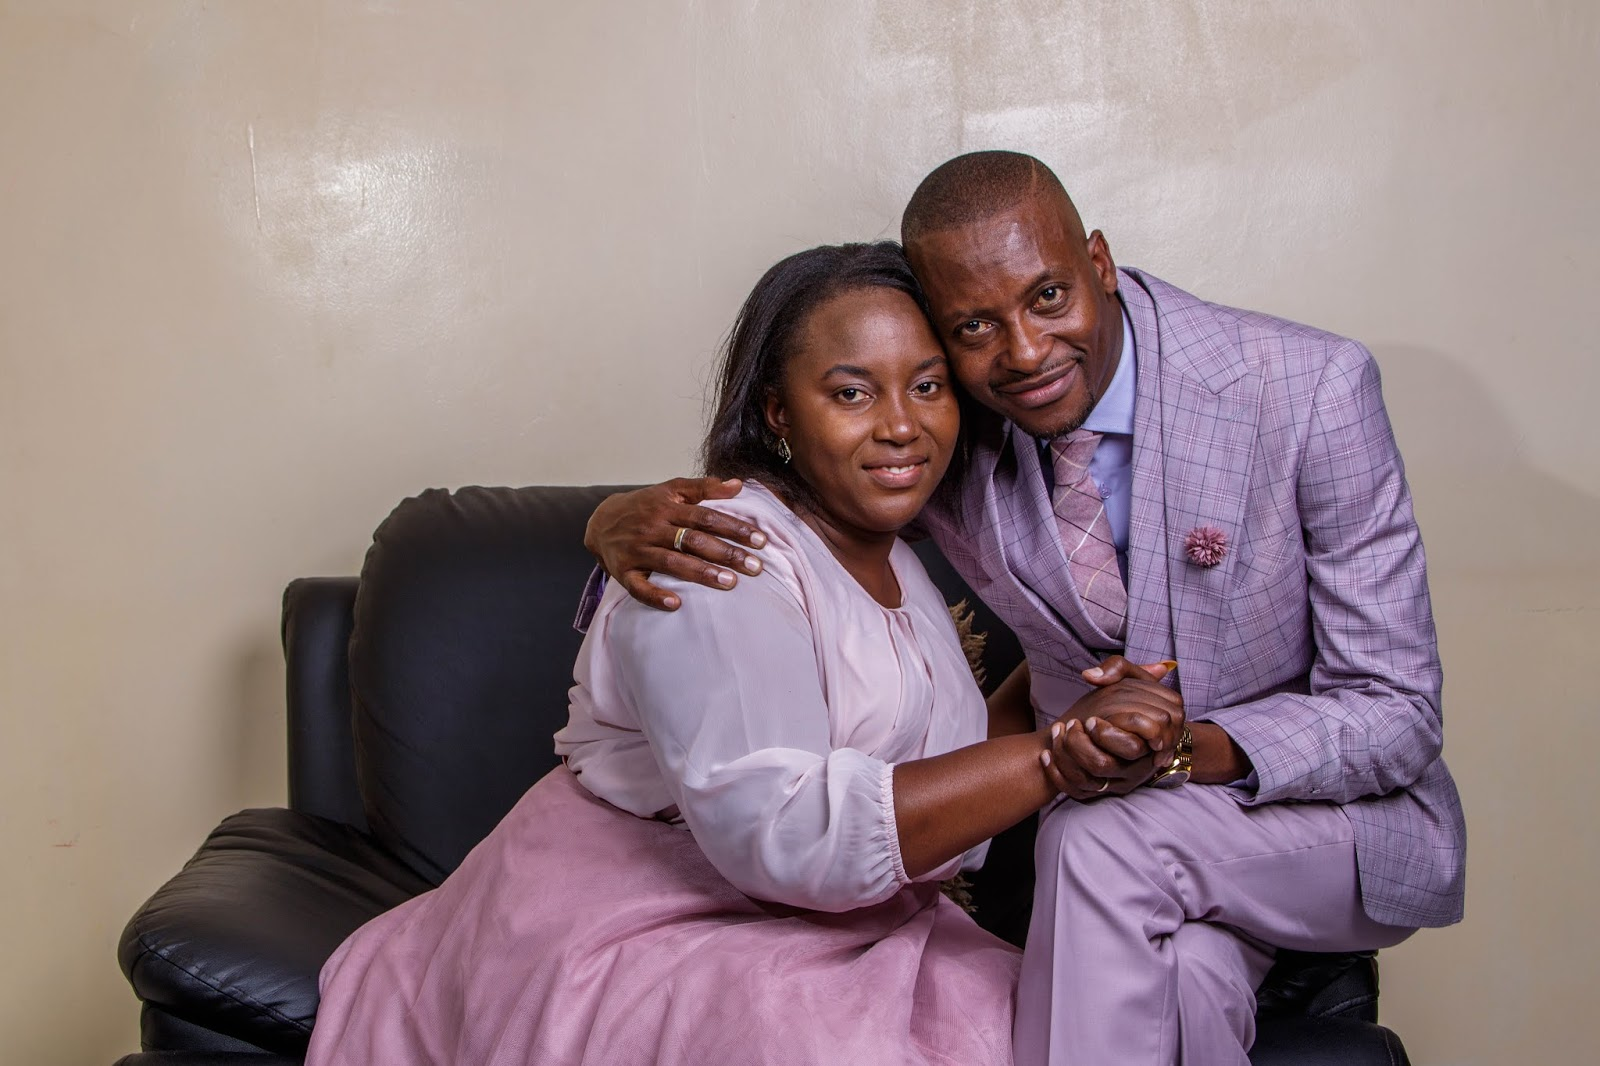 Apostle Pride and Anna Tendai Sibiya